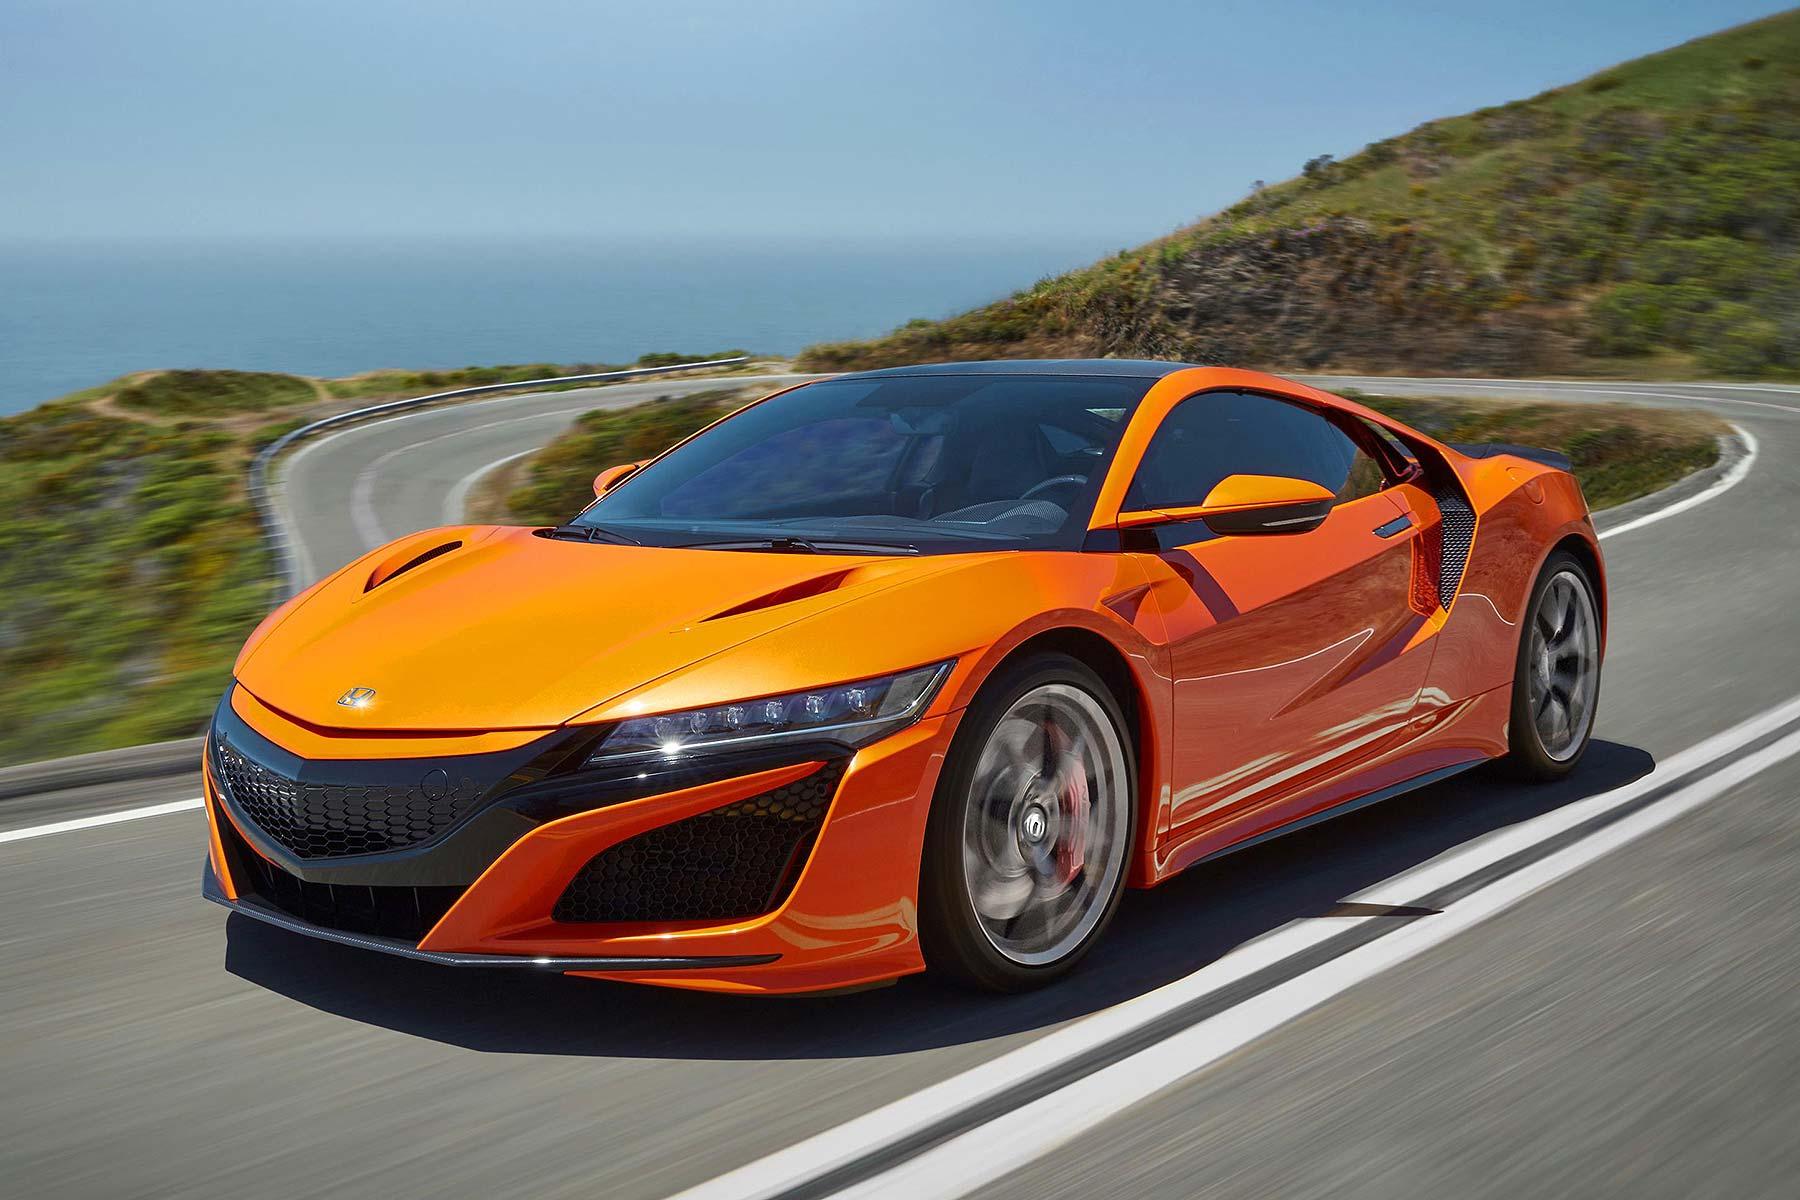 2019 Honda Nsx Is Sharper To Drive Greener And More Orange